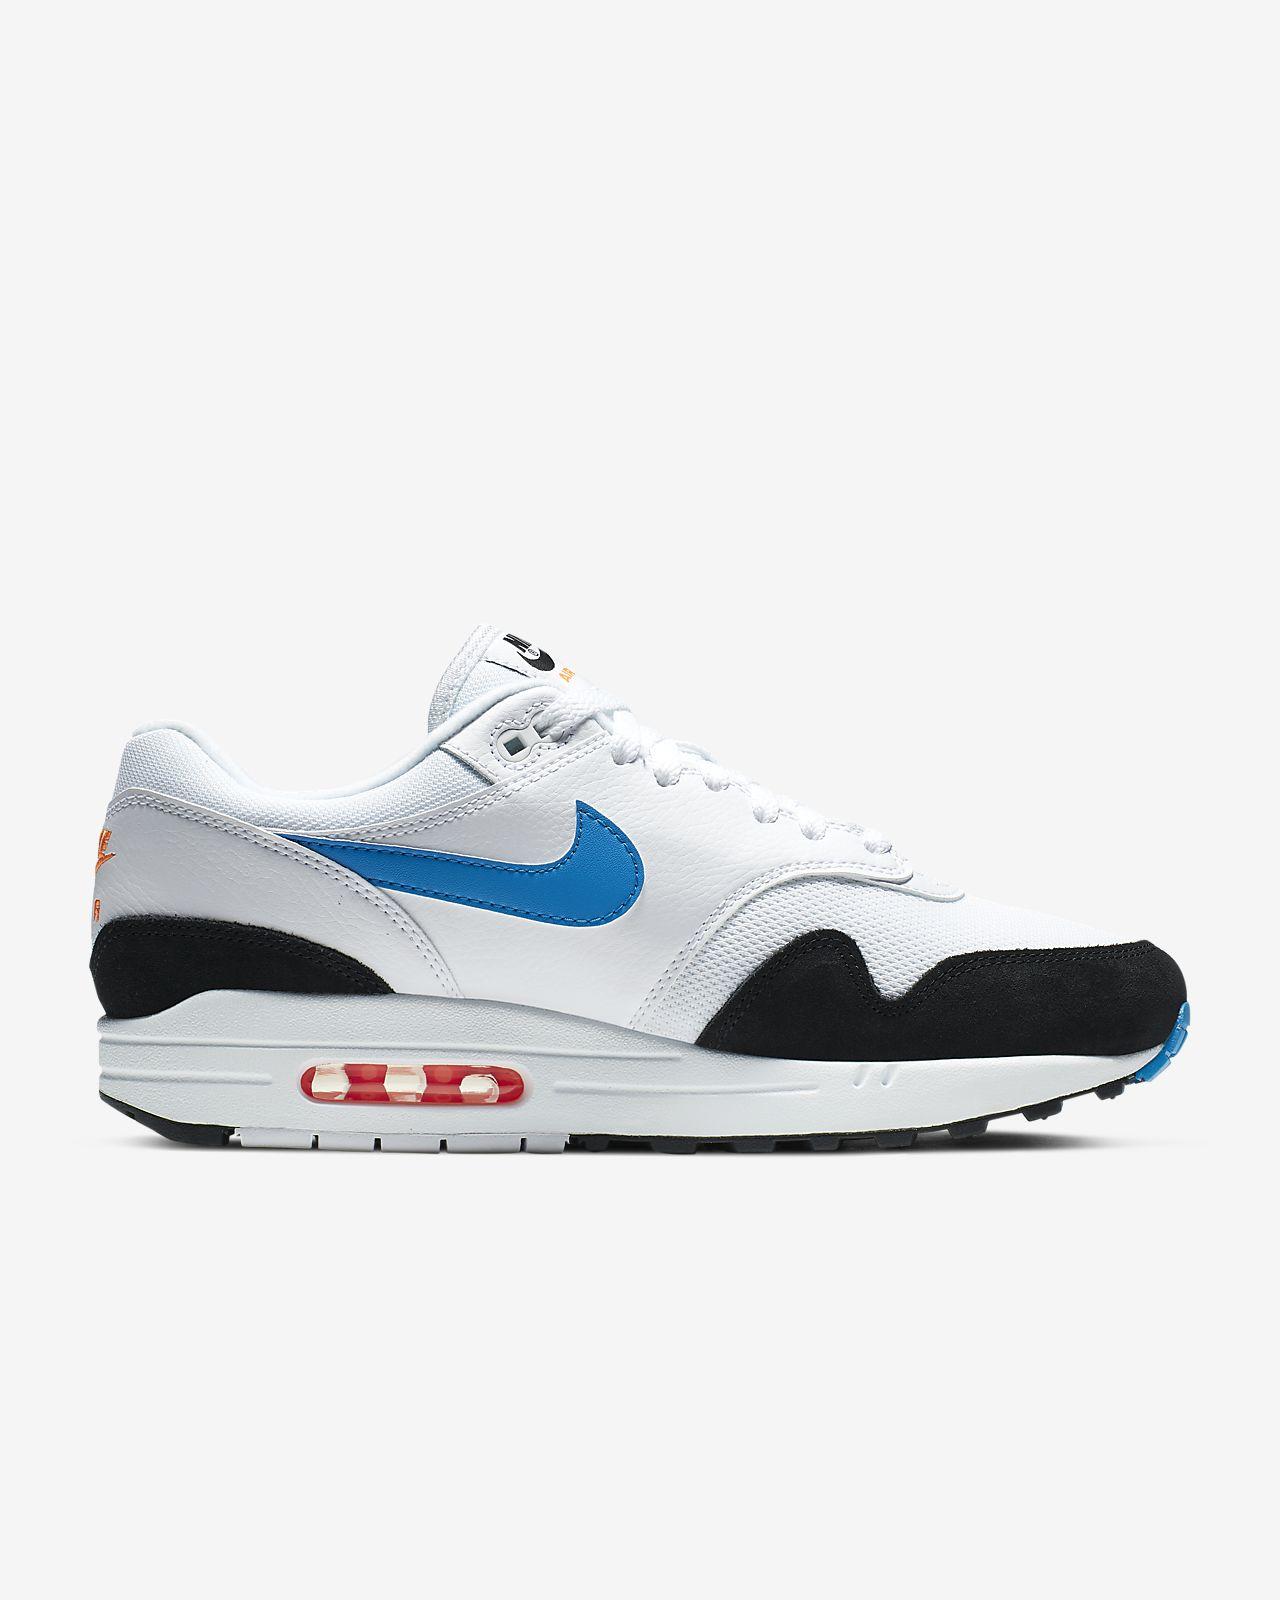 photos officielles 1478b 2984e Nike Air Max 1 Men's Shoe